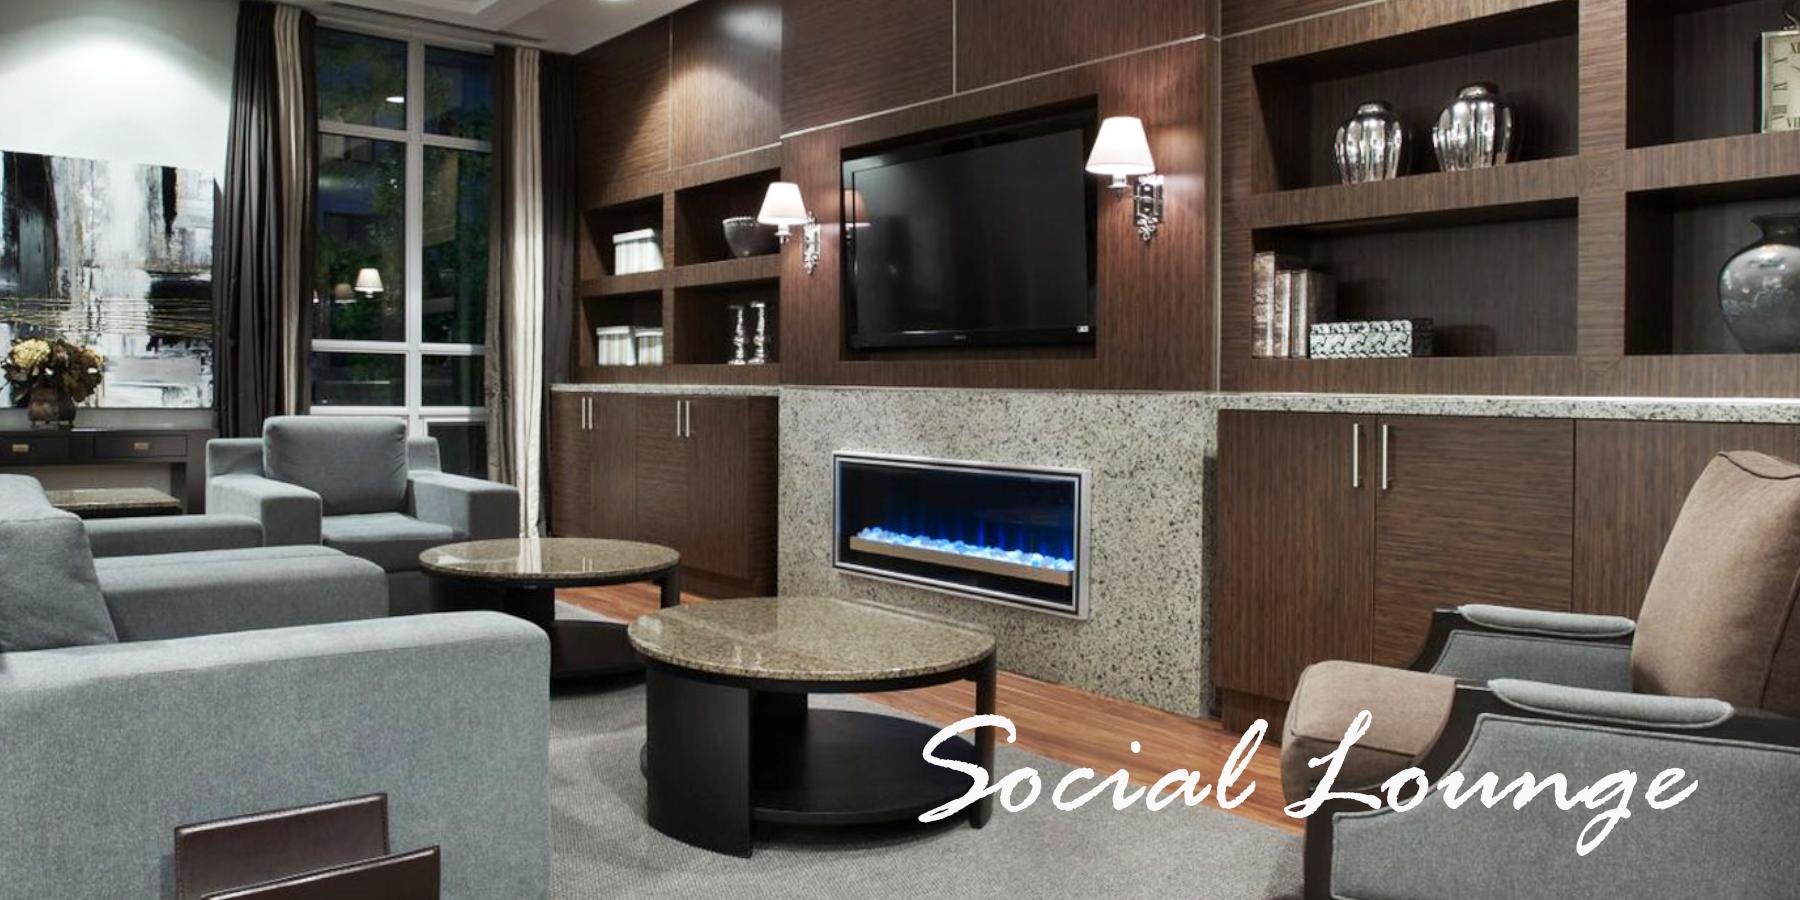 KG Apartment Luxury Rentals Harrison Social Lounge 1